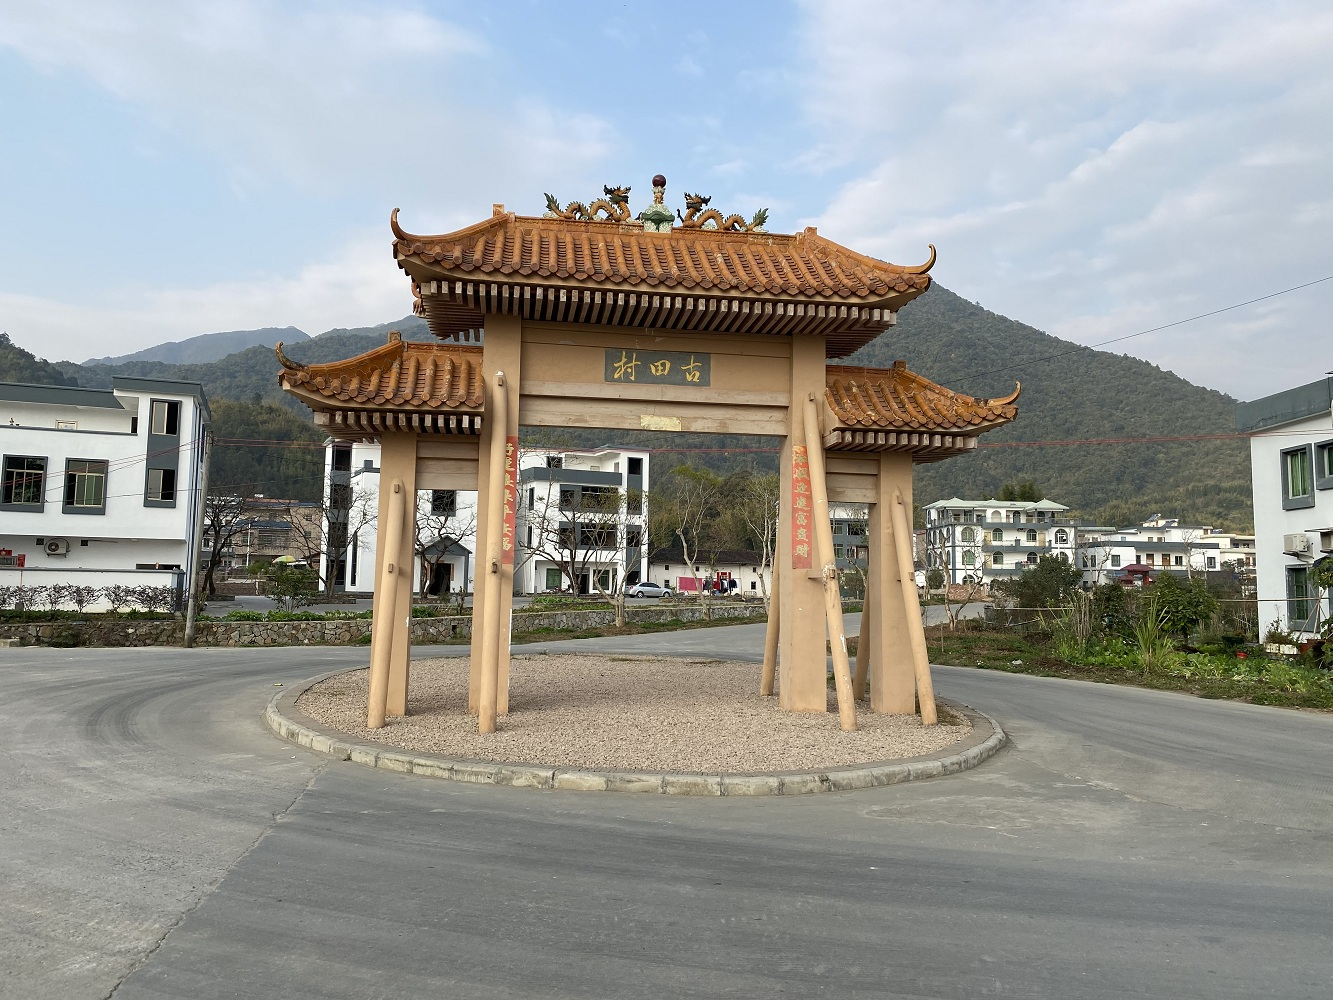 Gutian Town